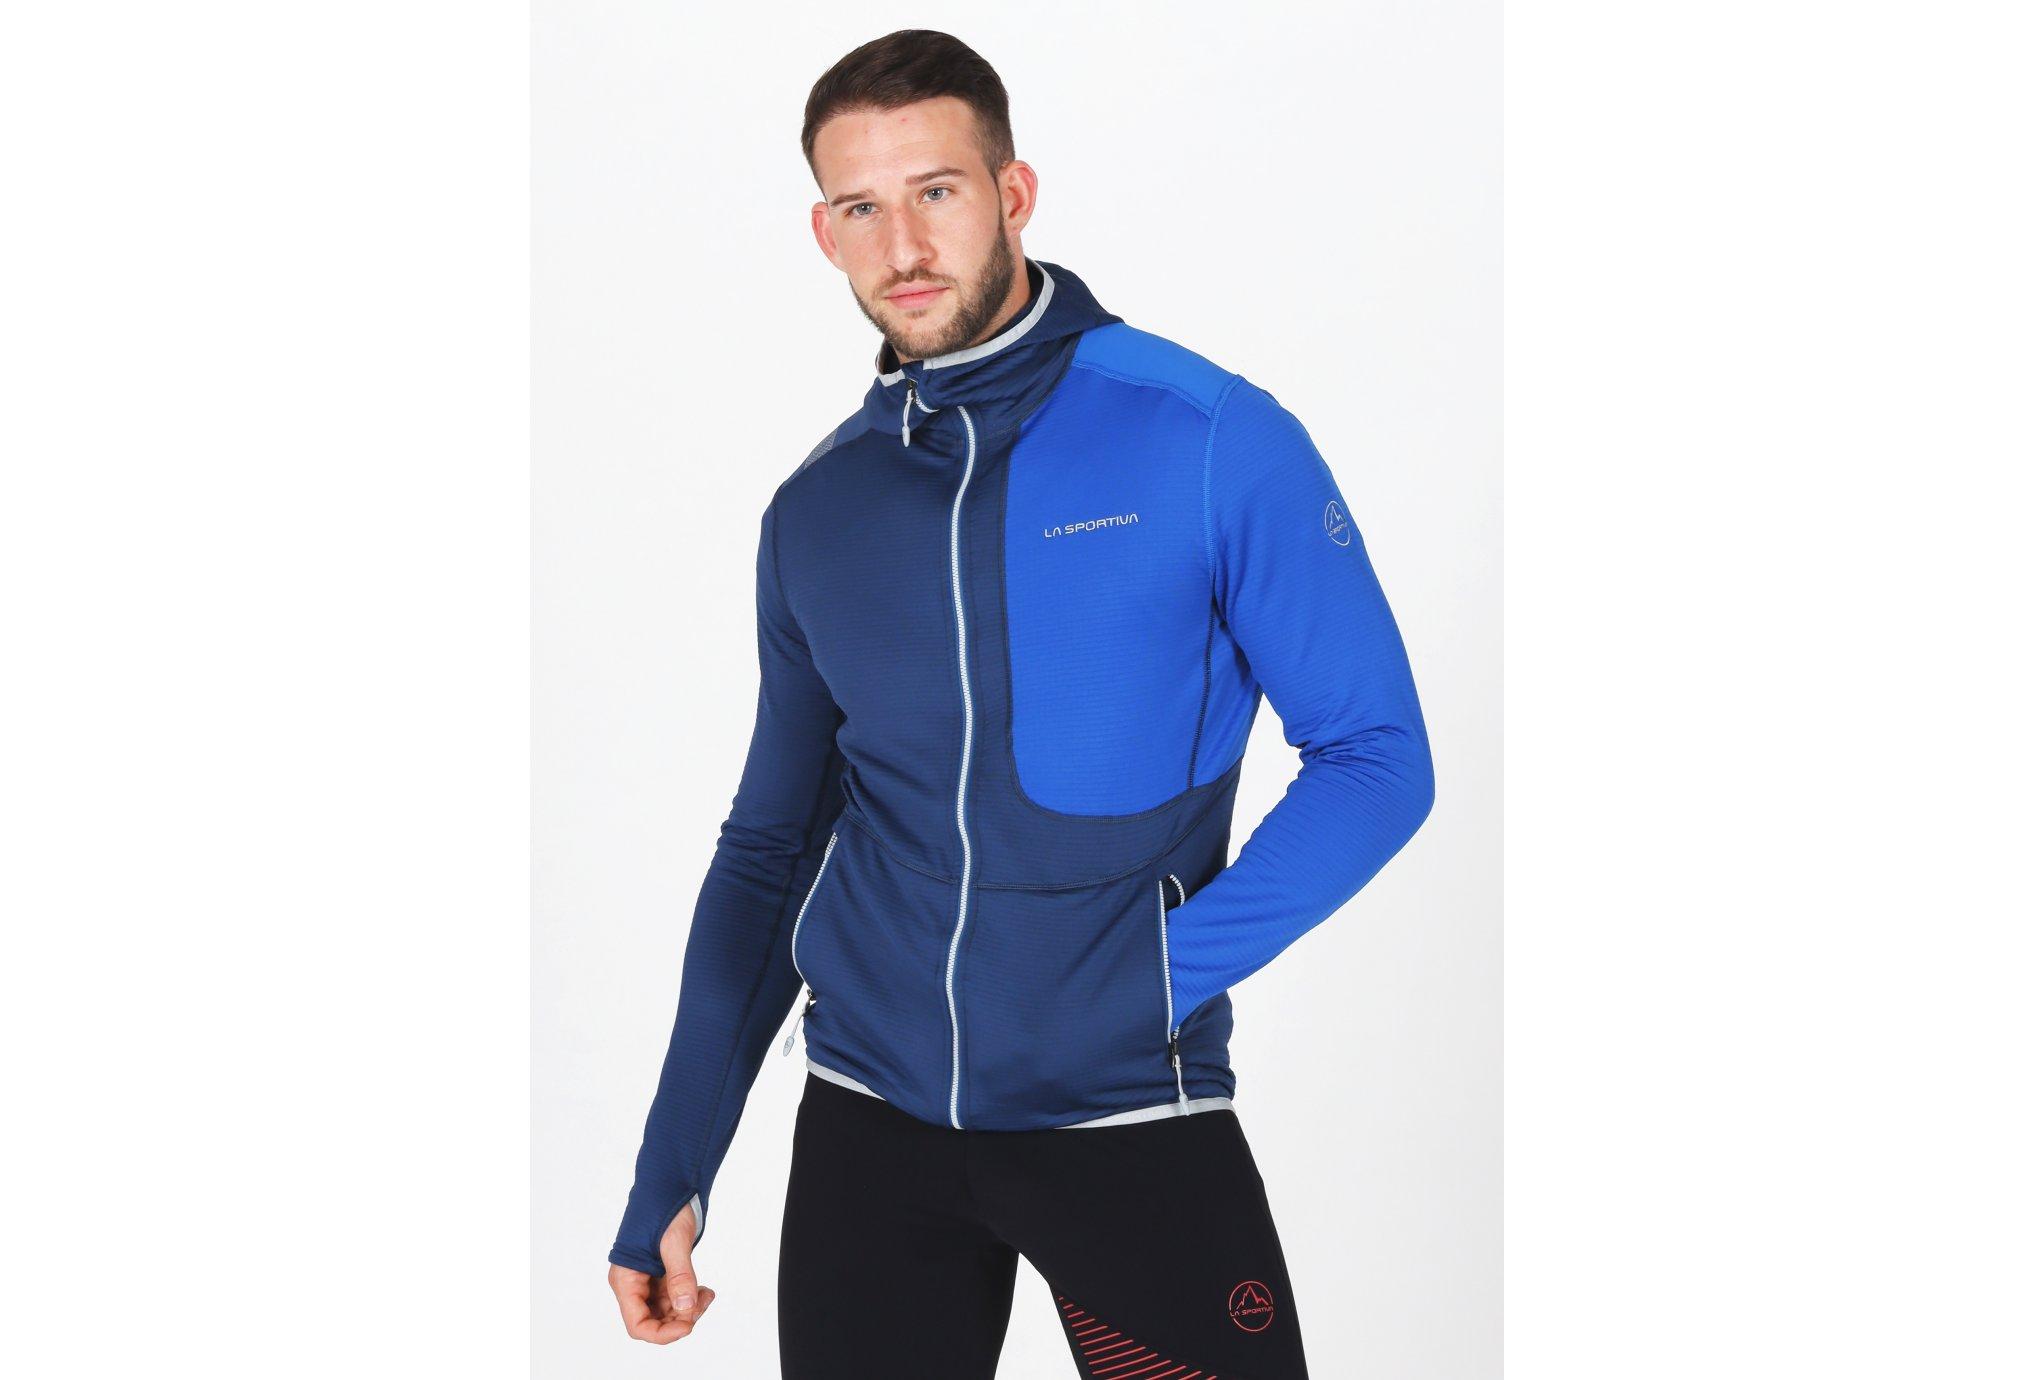 La Sportiva Upendo M vêtement running homme